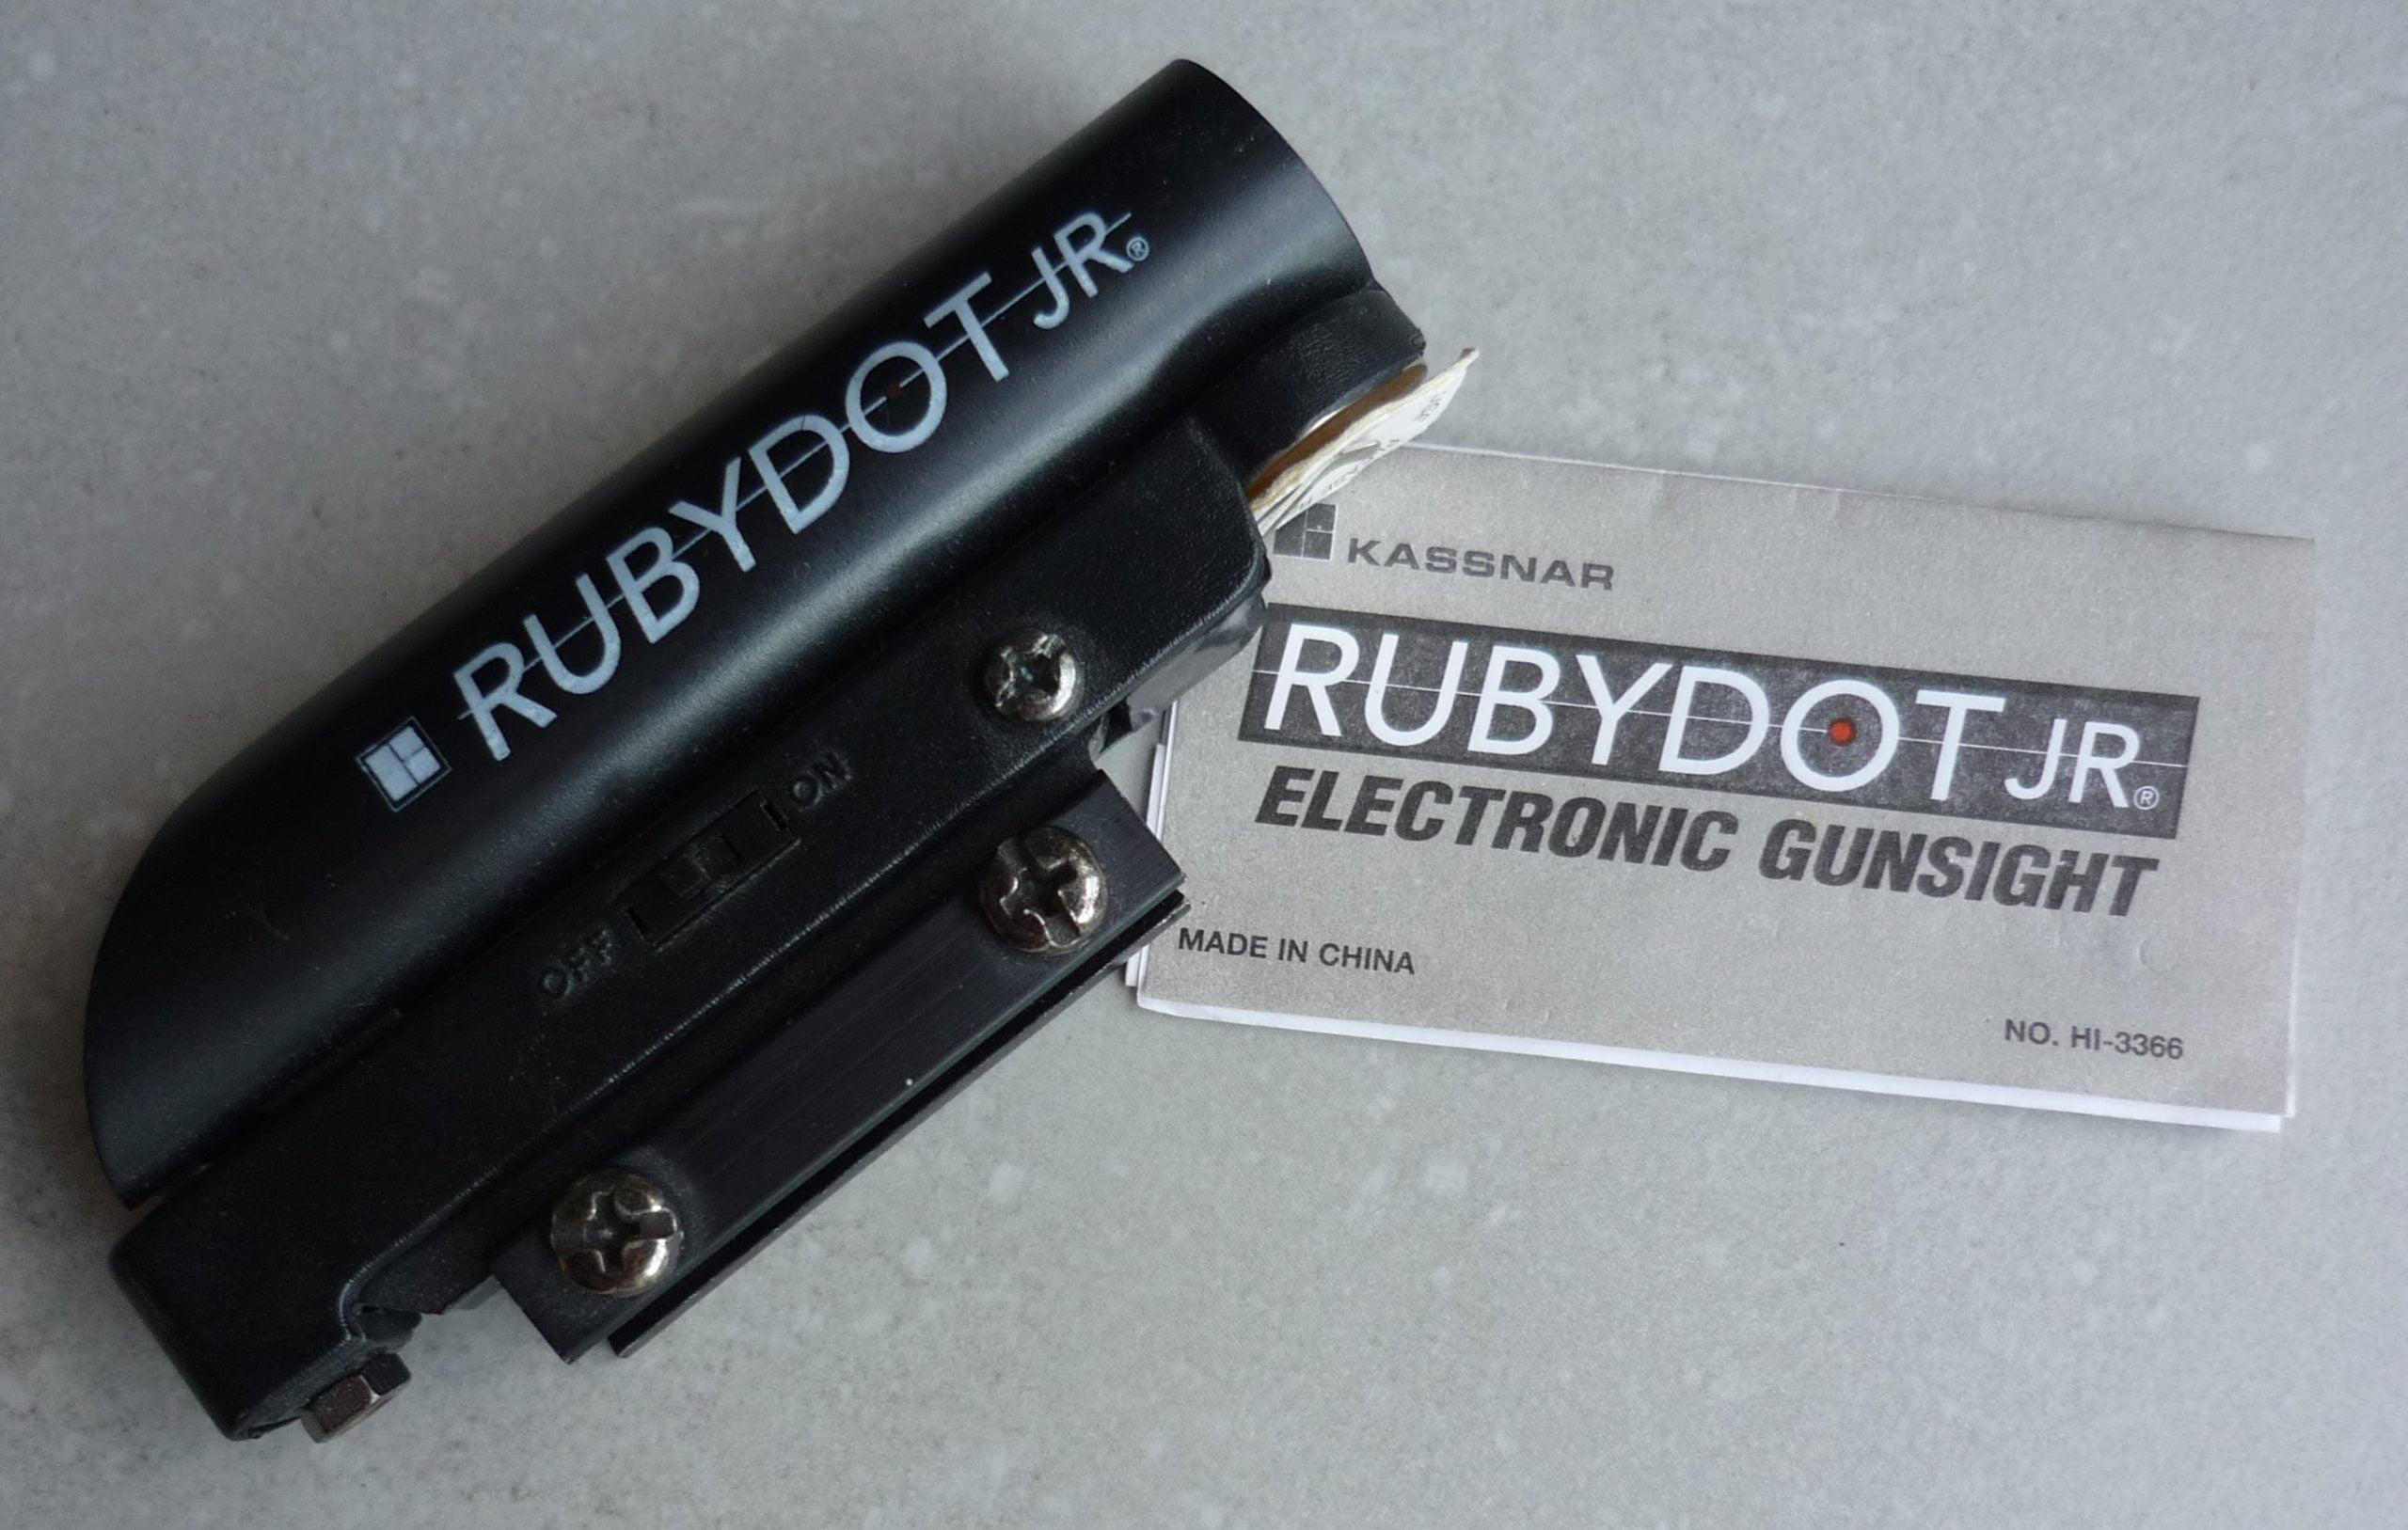 Système de visée point rouge Rubydot Jr Kassnar